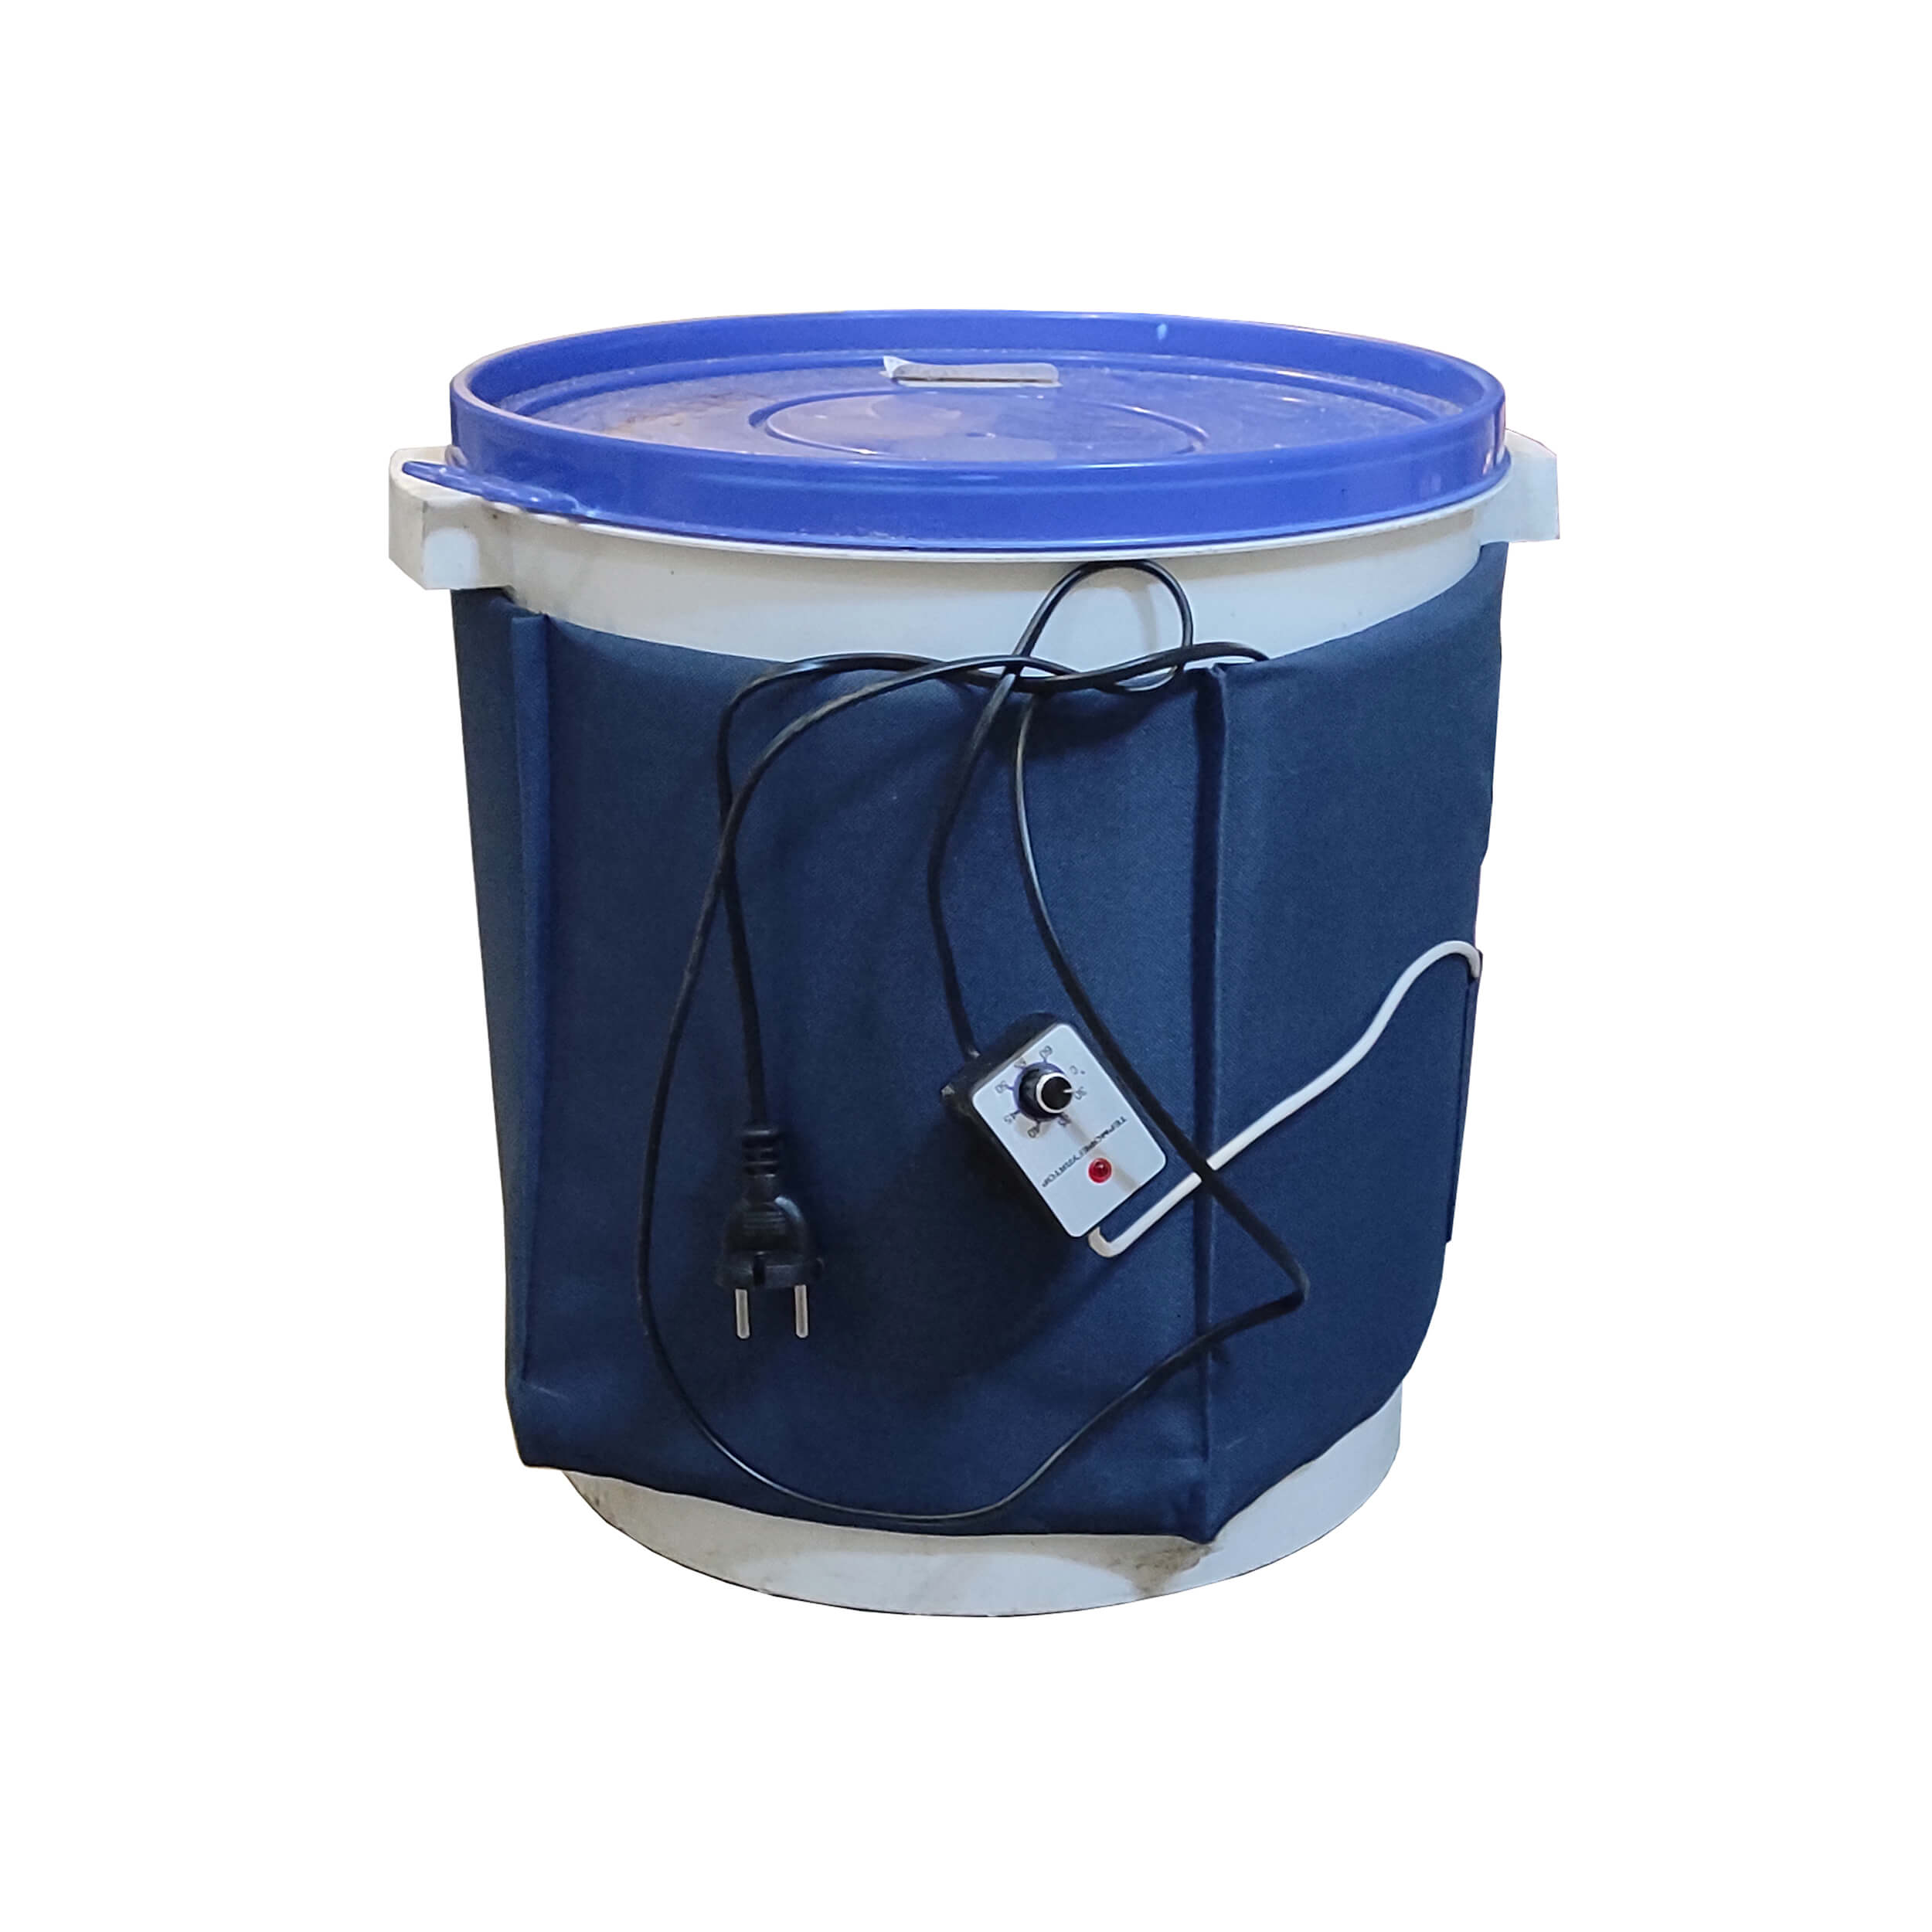 "Декристаллизатор меда на ведро с регулятором температуры ""ДМВ-30-220"" (220B) фото"